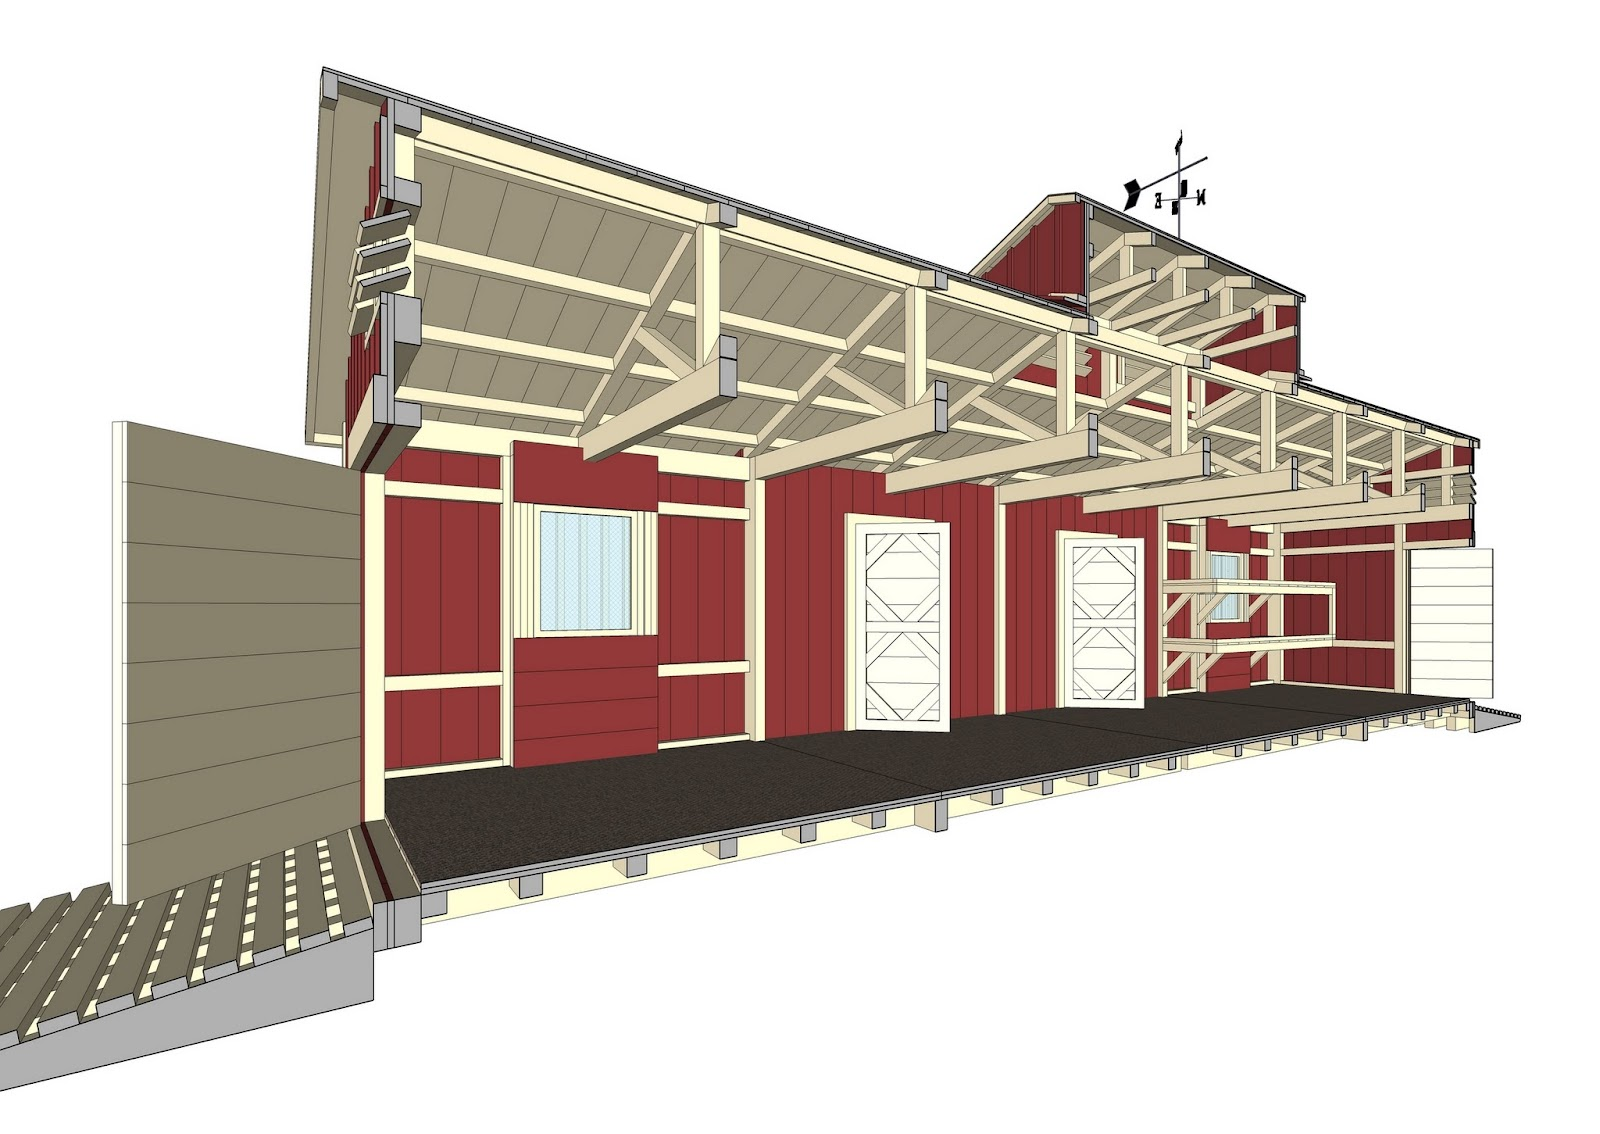 ... +shed+plans+-+storage+shed+plans+-+garden+shed+plans+construction.jpg